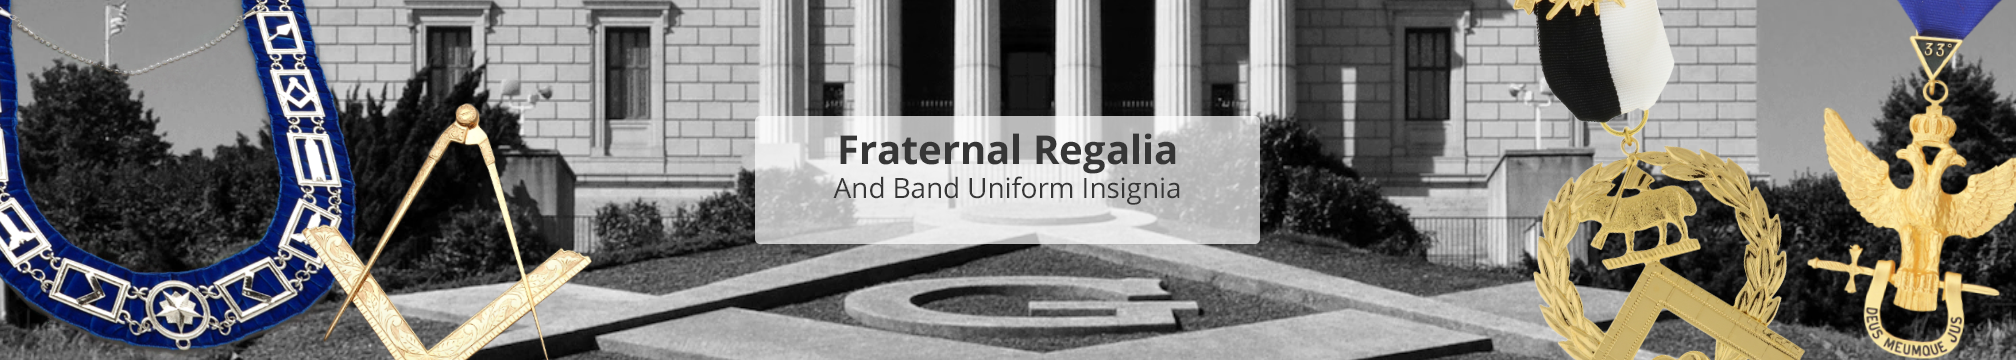 Fraternal Regalia